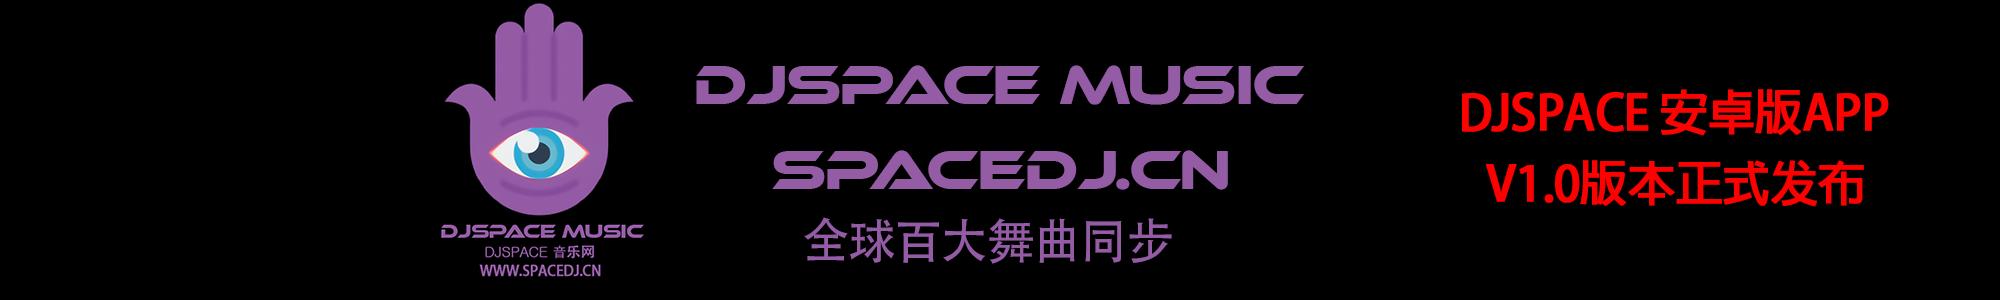 DJSPACE #正式开启支付宝在线支付功能#